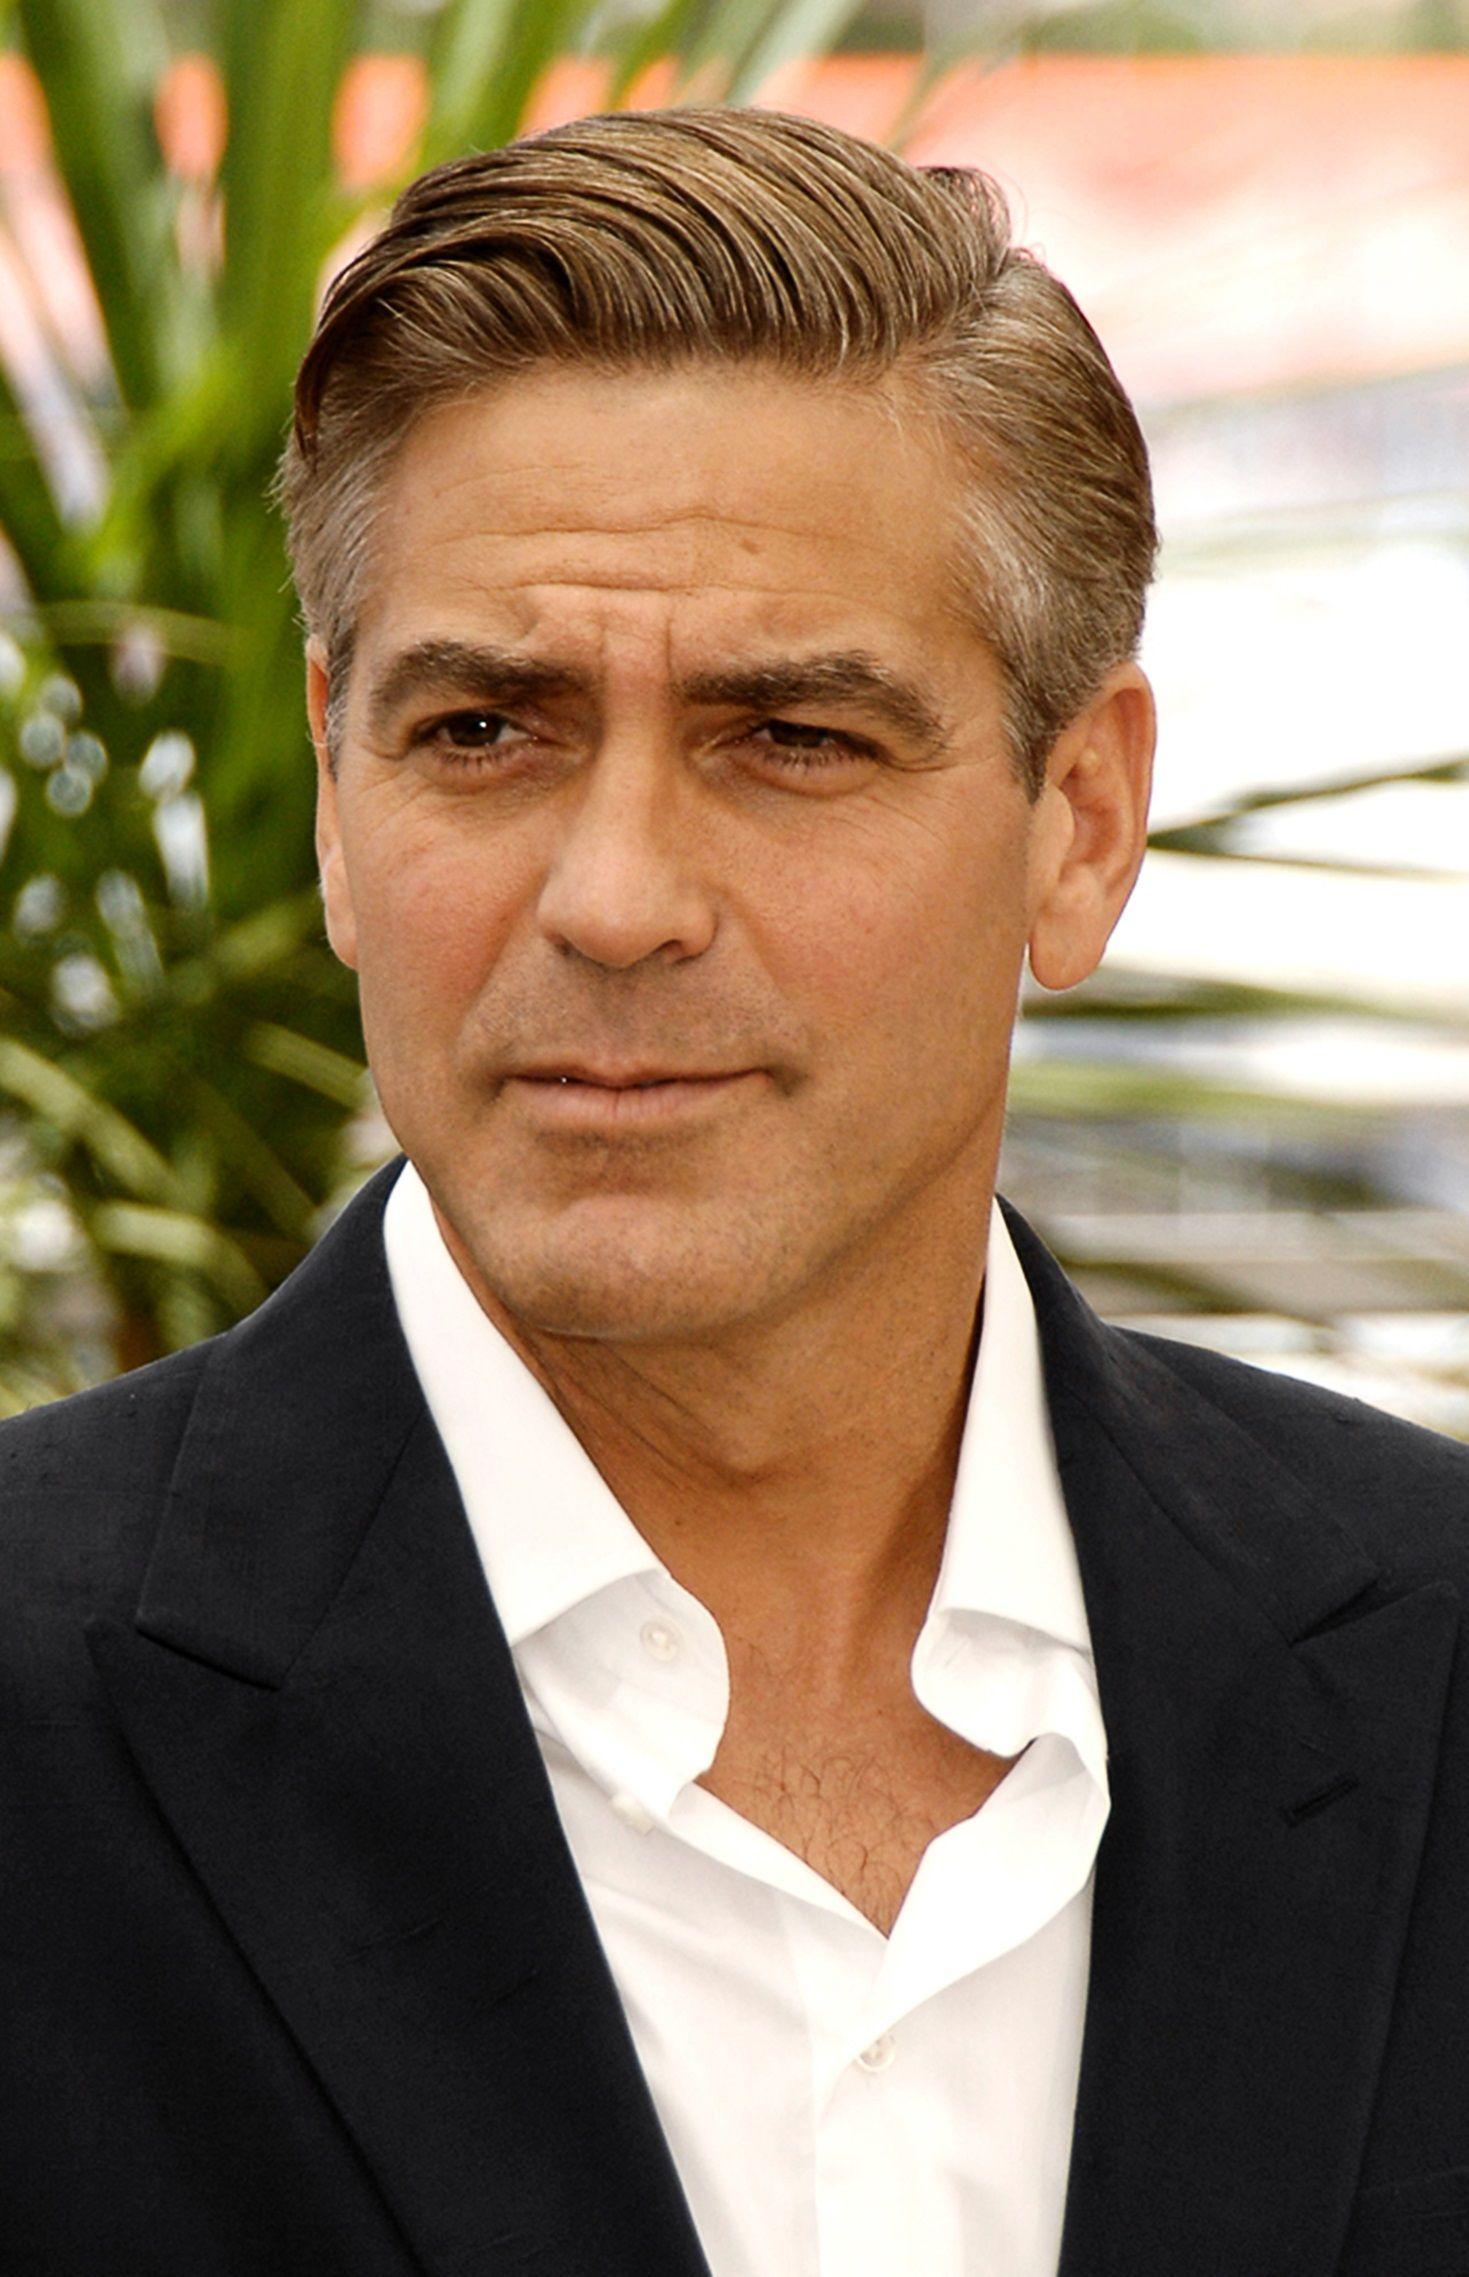 George Clooney Ältere Herren Frisuren, 40er Frisuren, Neue Frisuren,  Moderne Haarschnitte, Alte 278b476ff0